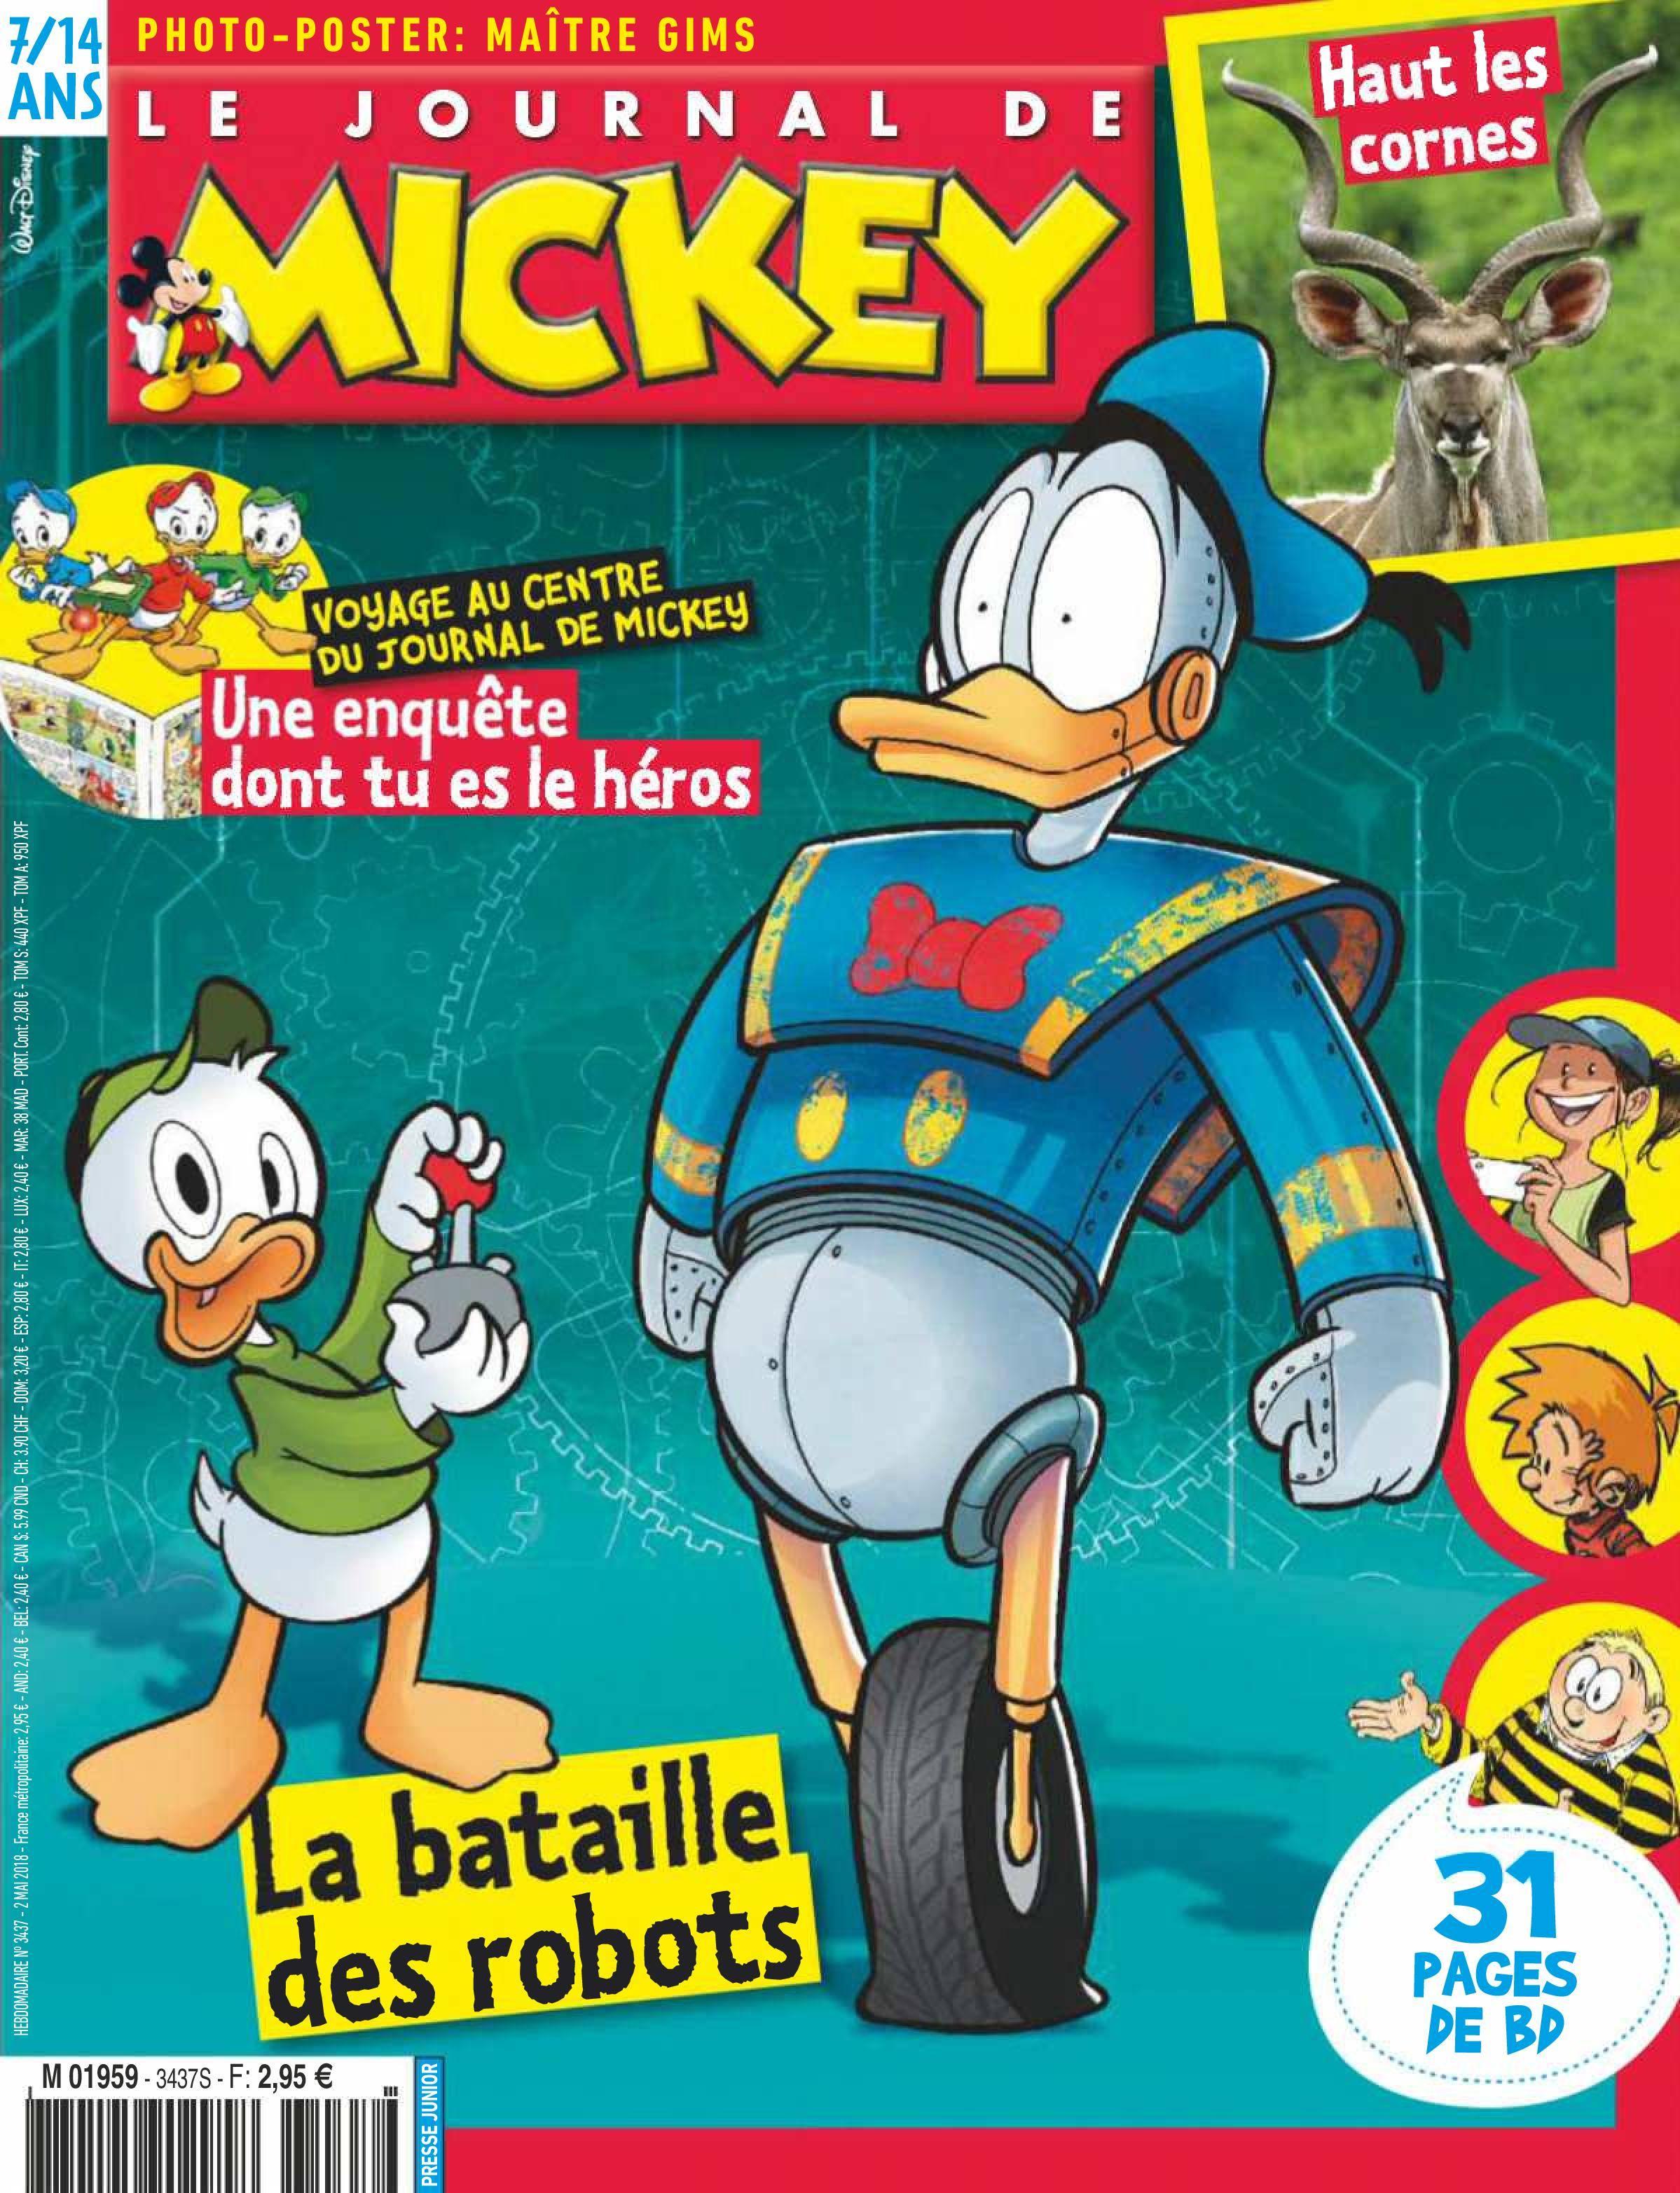 Le Journal de Mickey - 02 mai 2018